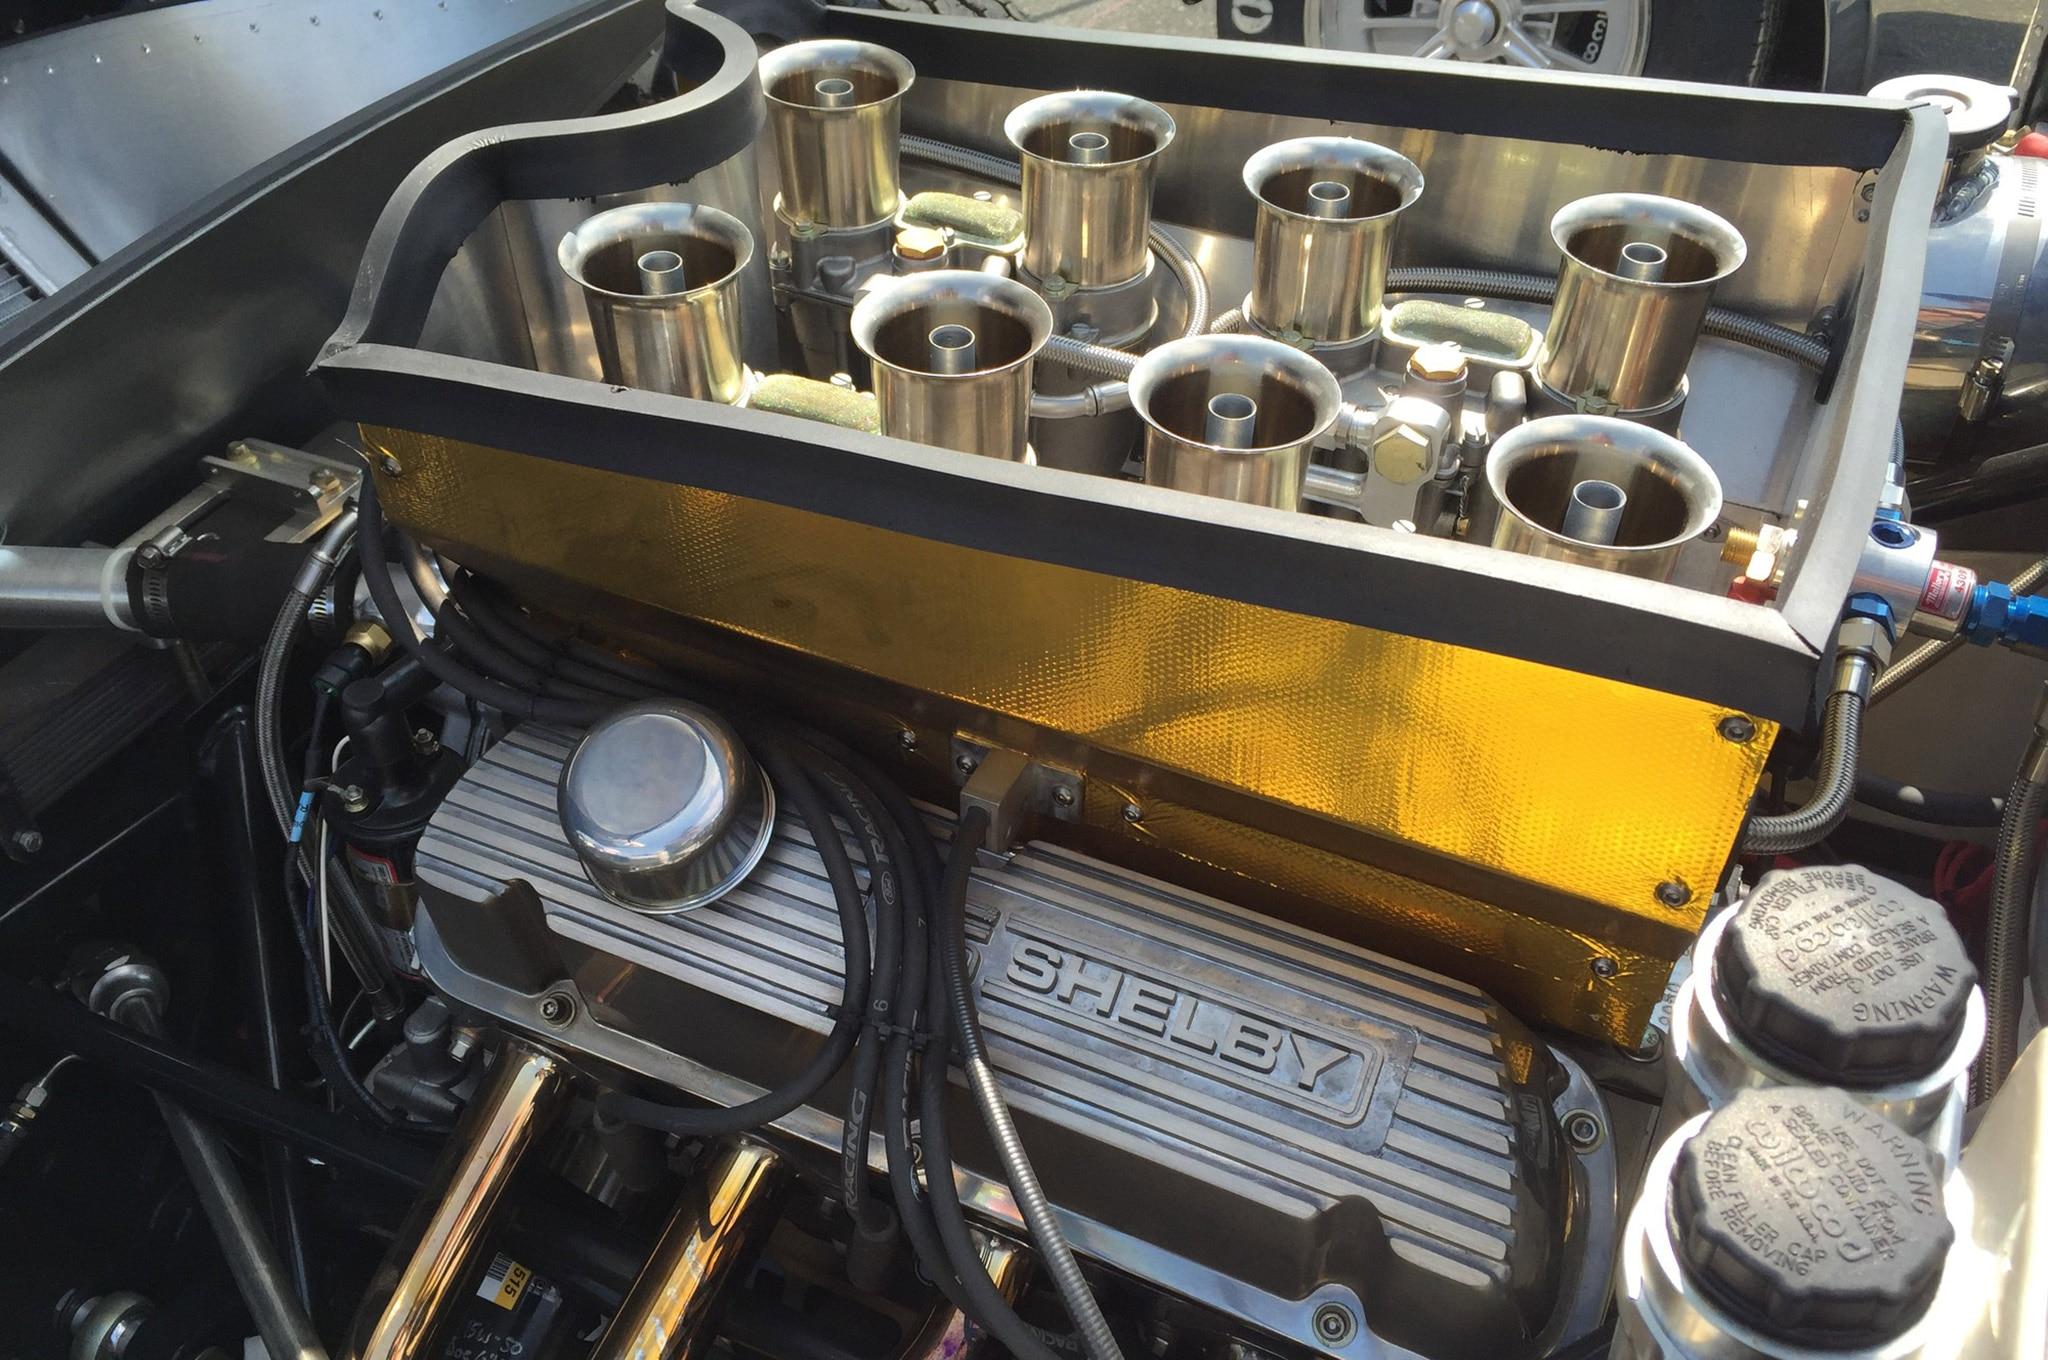 50th Anniversary Polished Shelby Daytona Coupe Engine